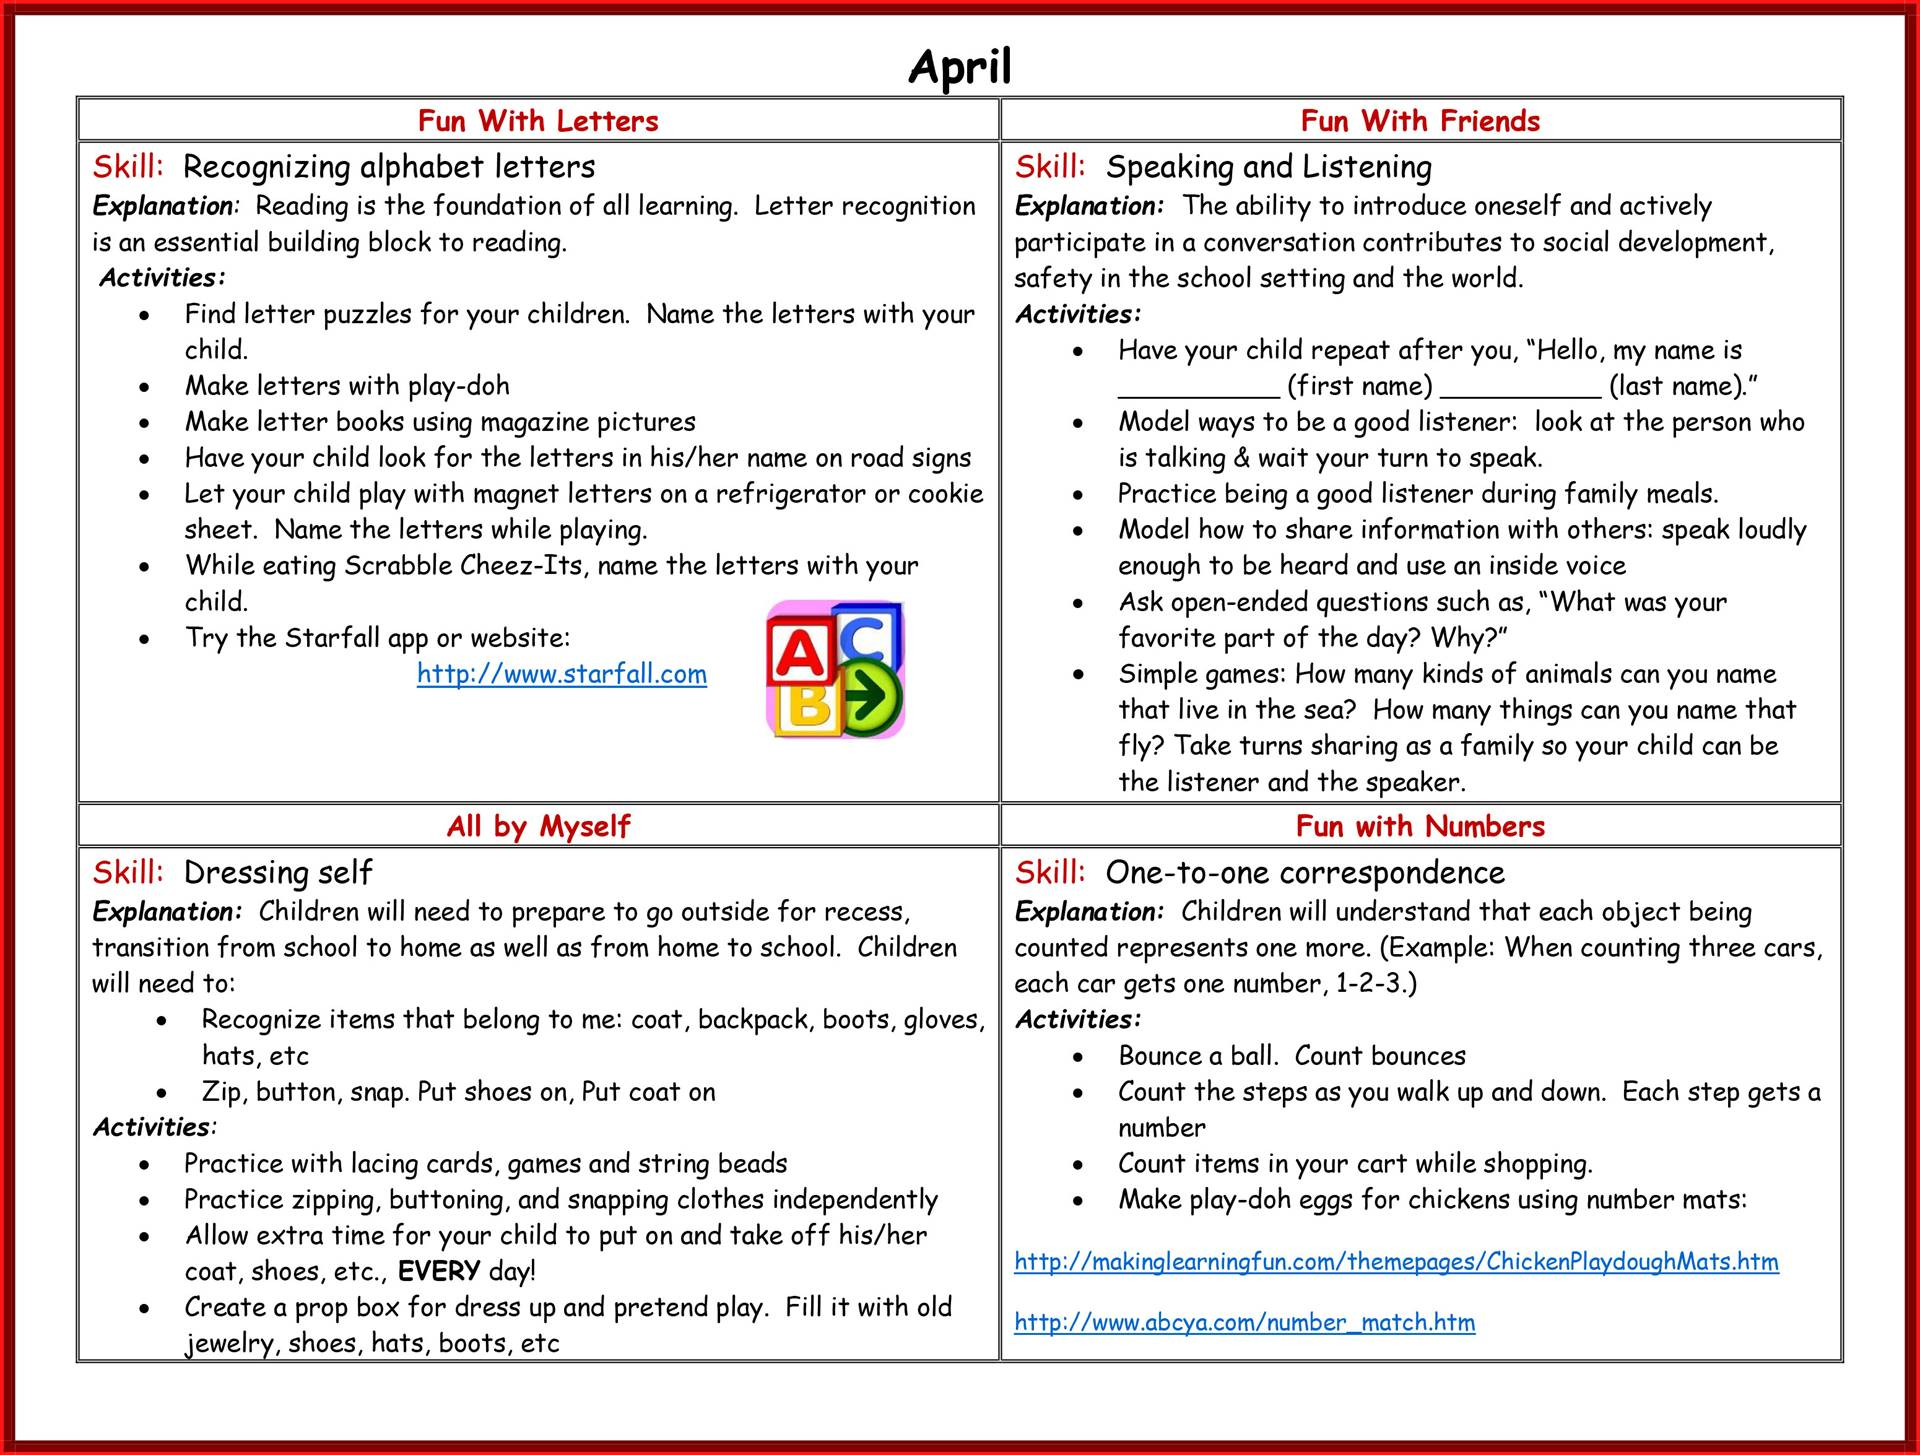 Kindergarten Readiness Calendar - April page 2